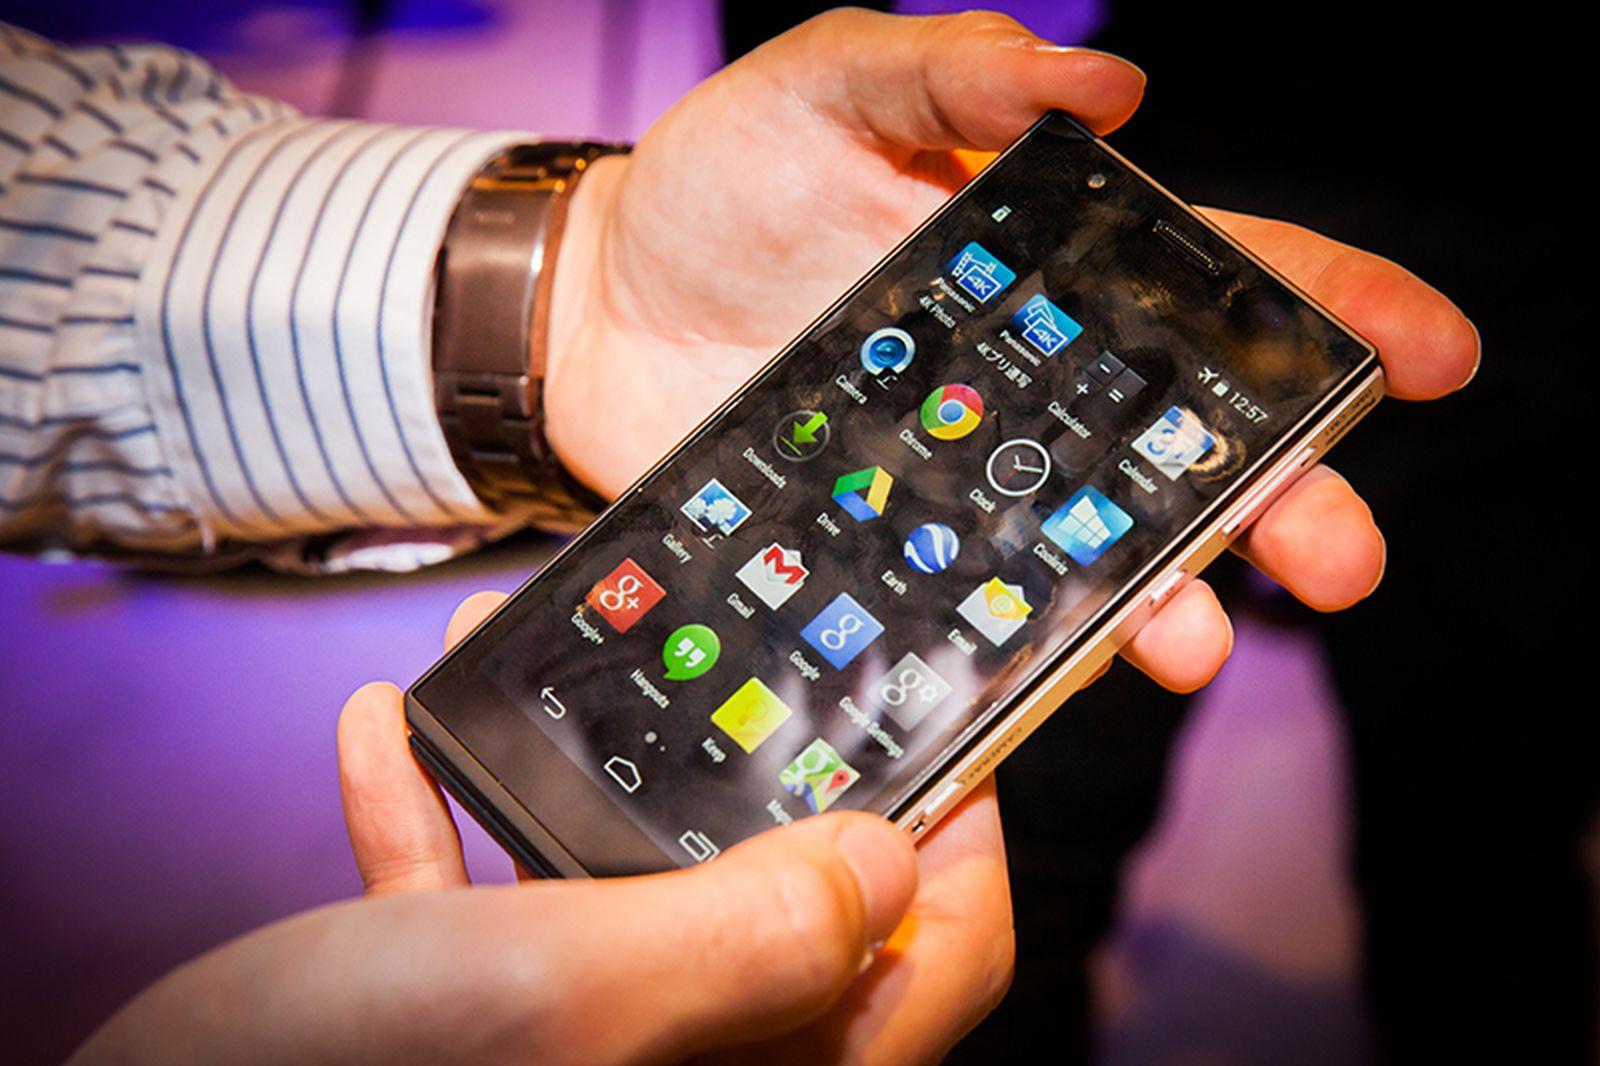 Panasonic DMC-CM1 Receives Android 5 0 Lollipop - Download Firmware